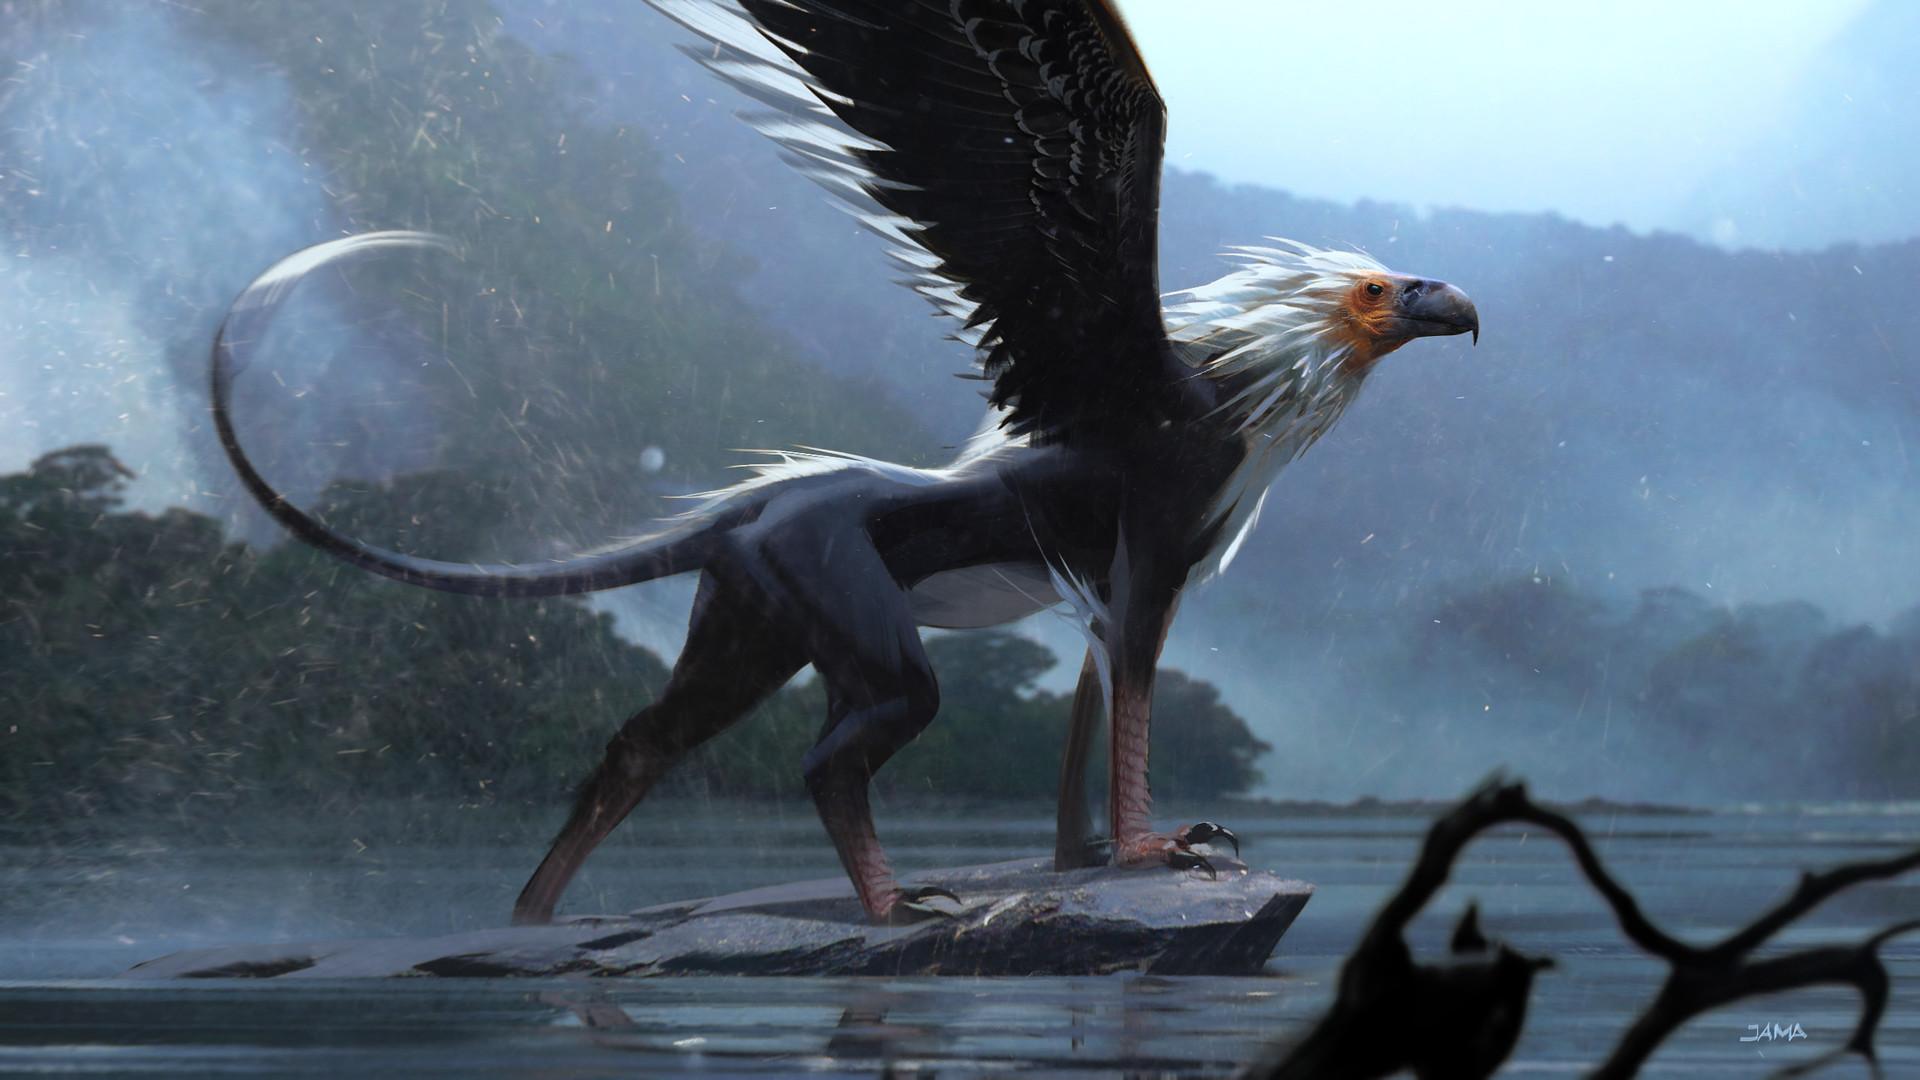 Обои крылья, Схватка, гриф. Лисы foto 10